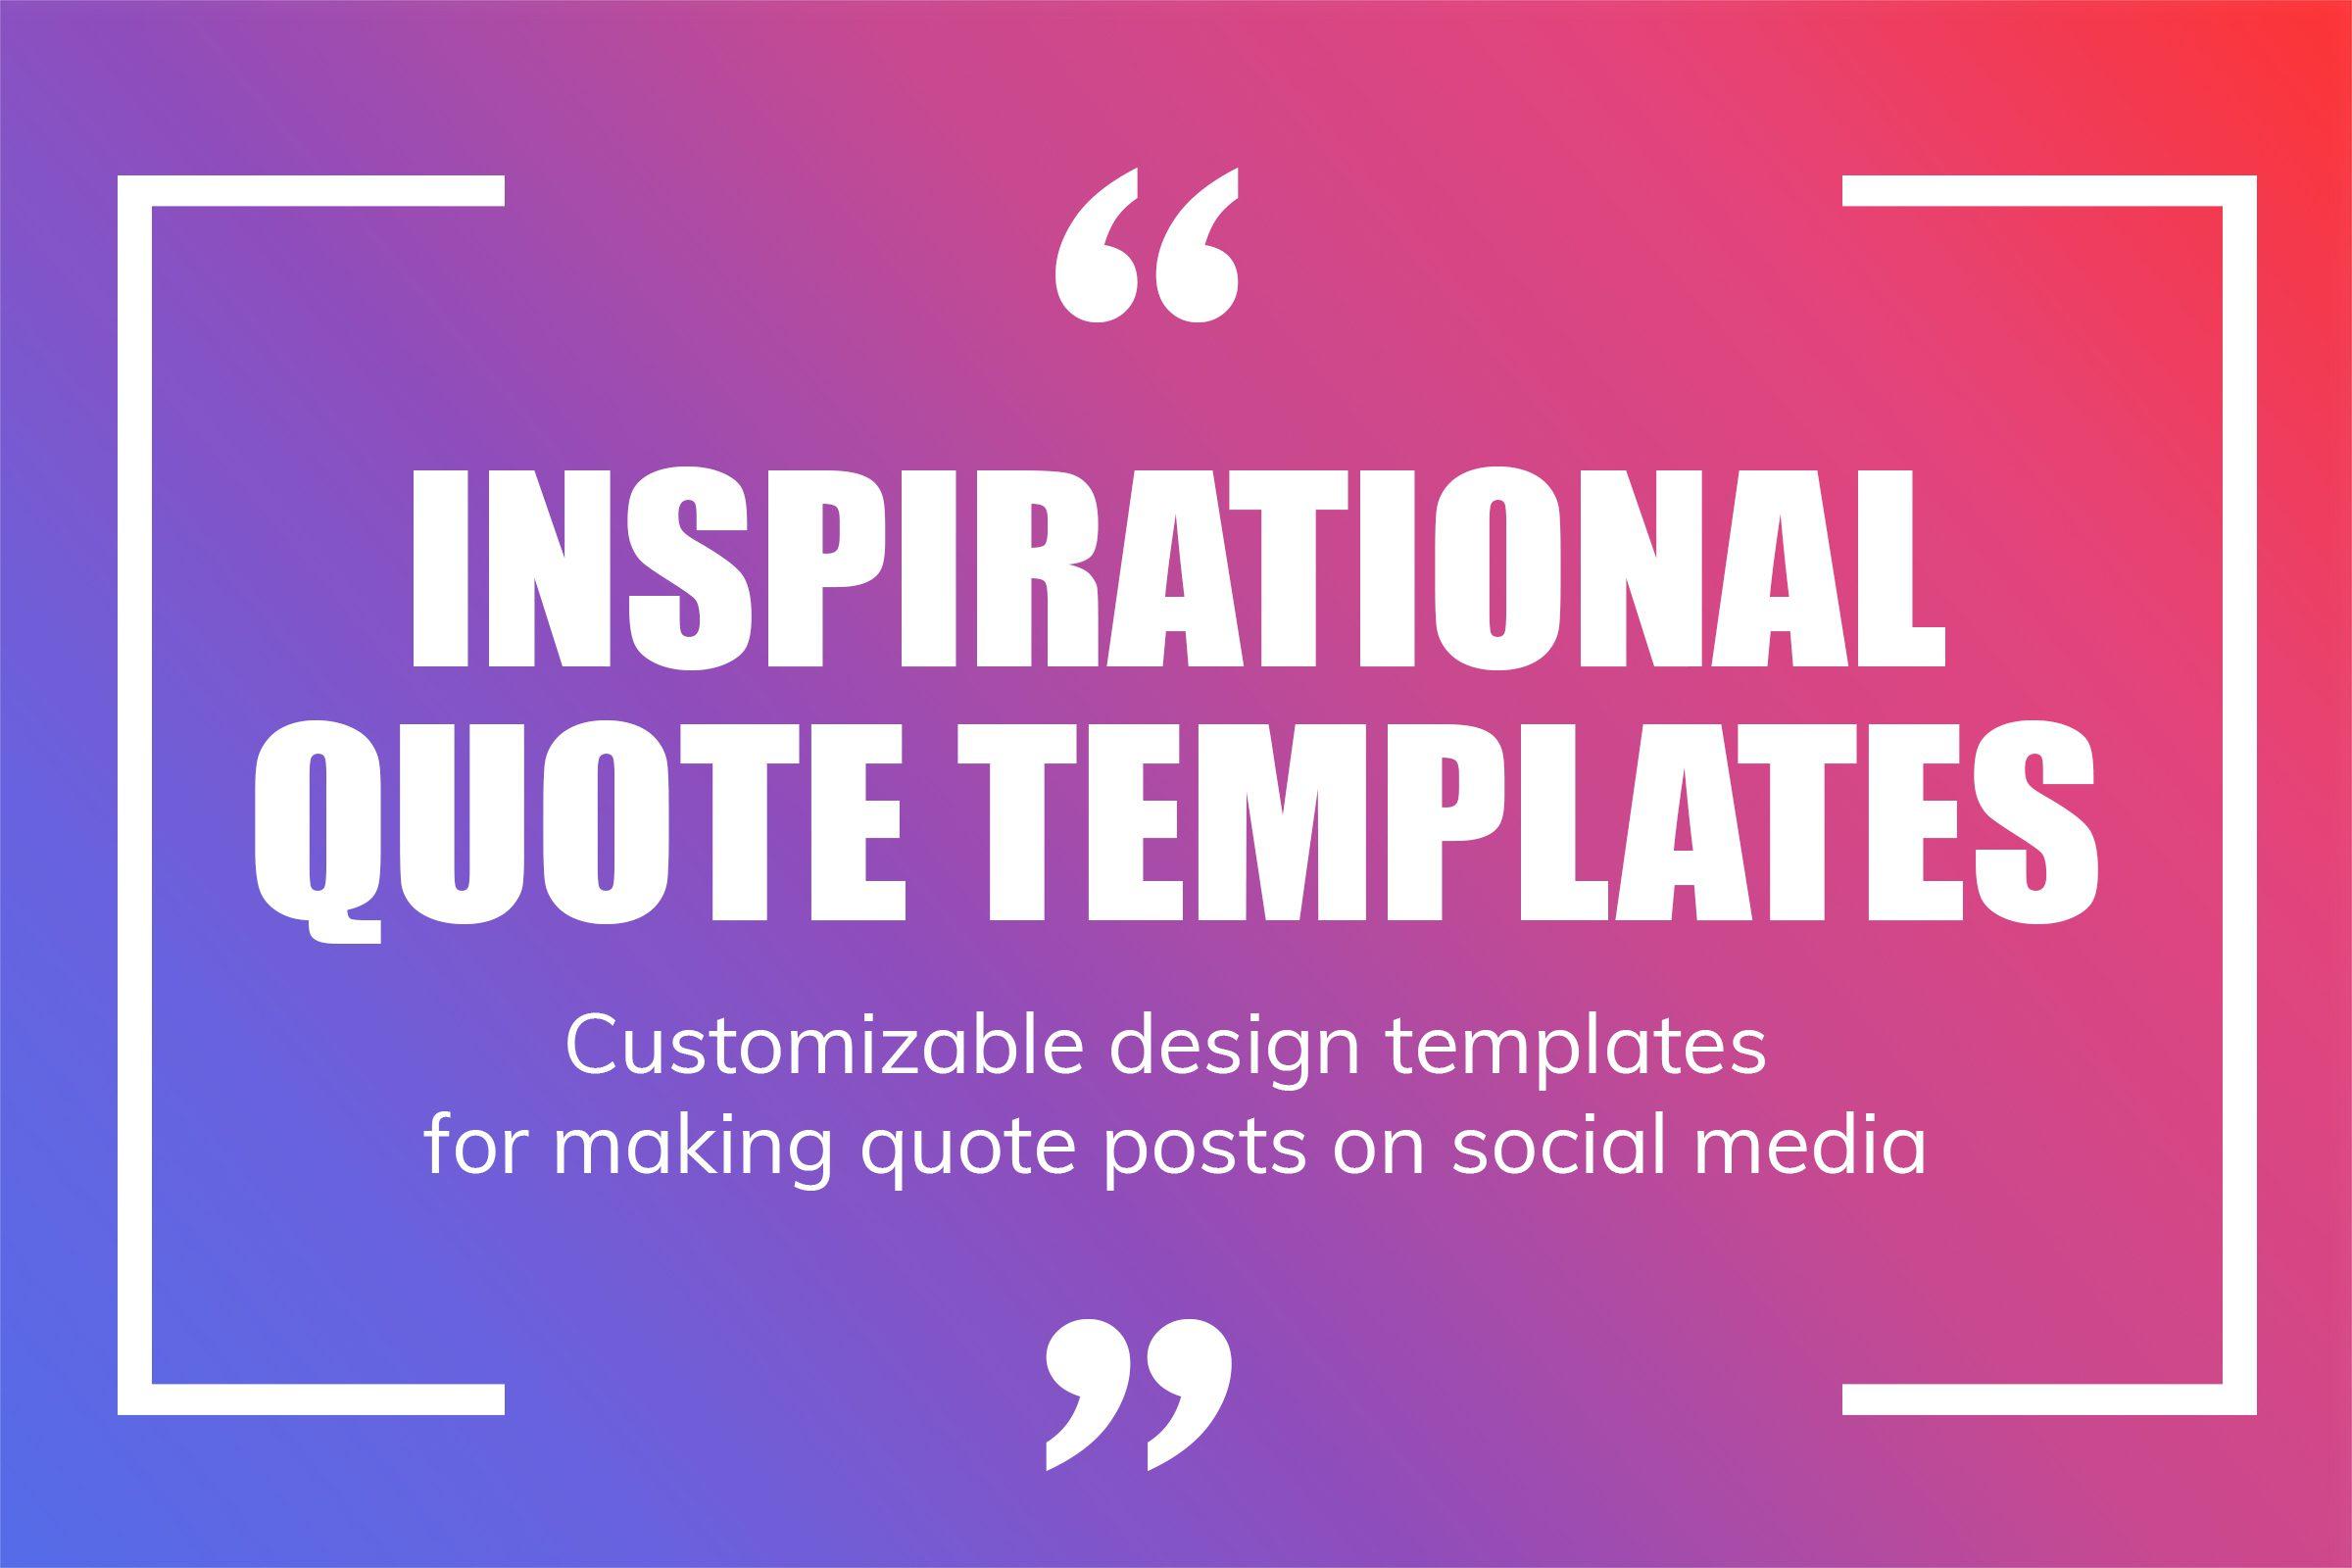 Quote Templates from mediamodifier.com